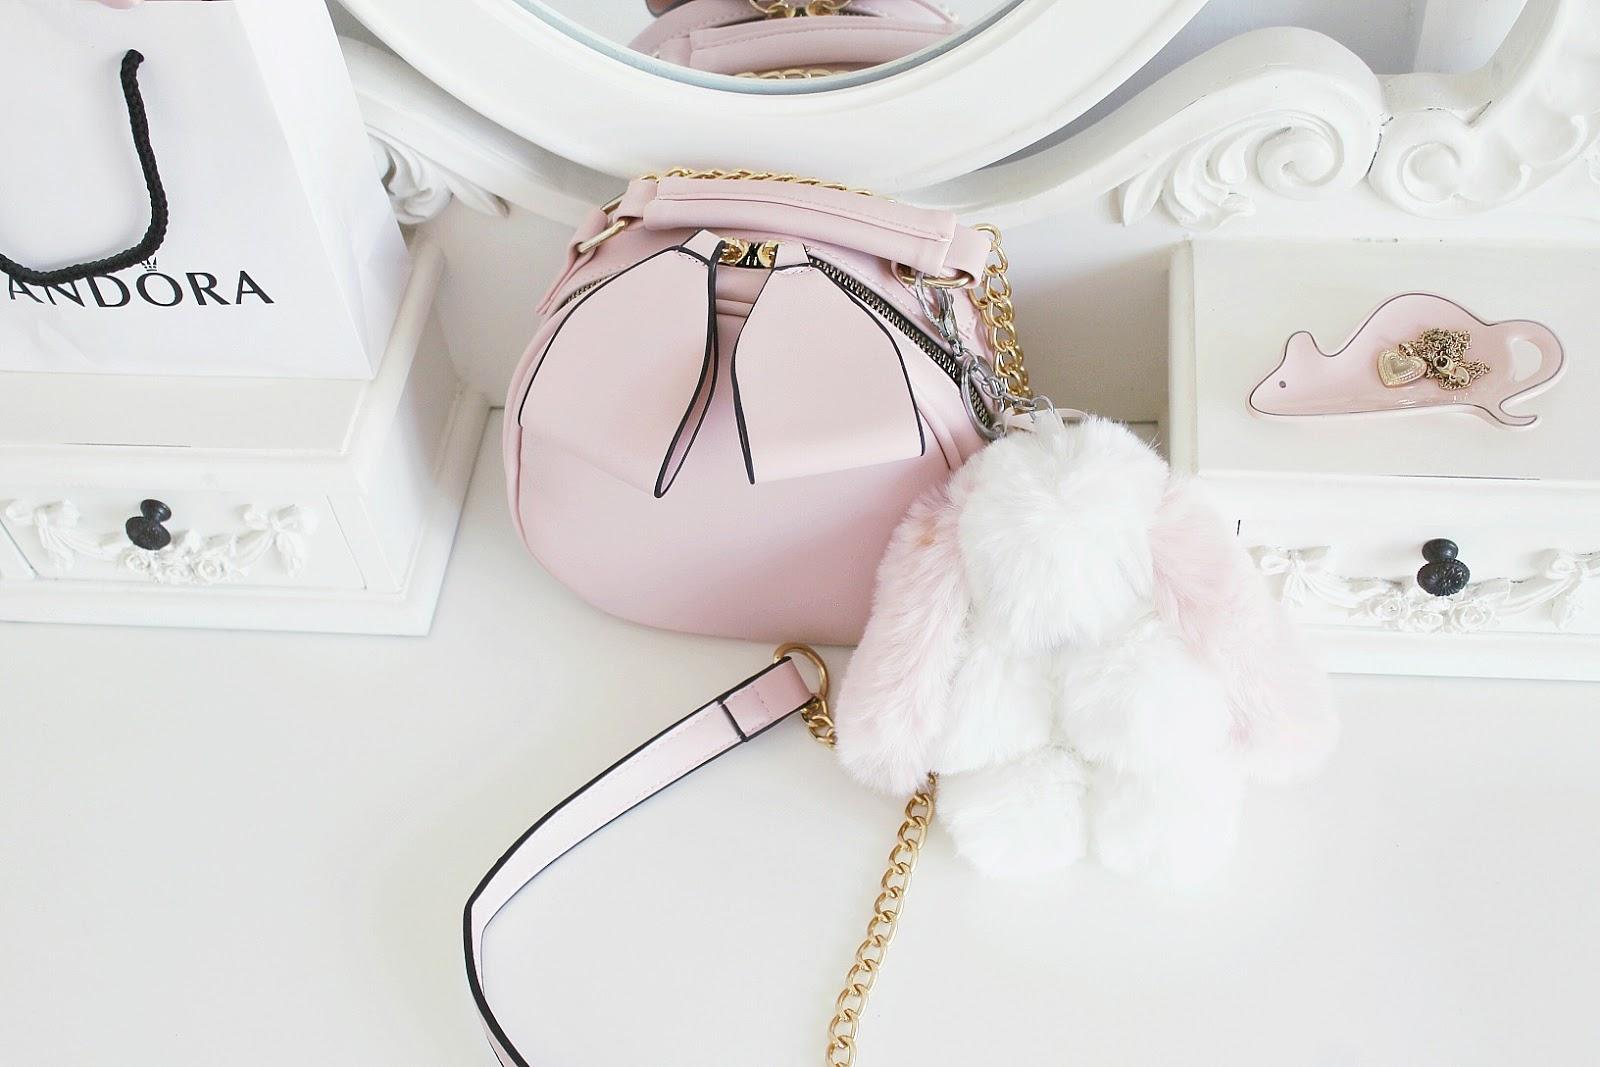 Girly beauty tips, girly aesthetic makeup blog